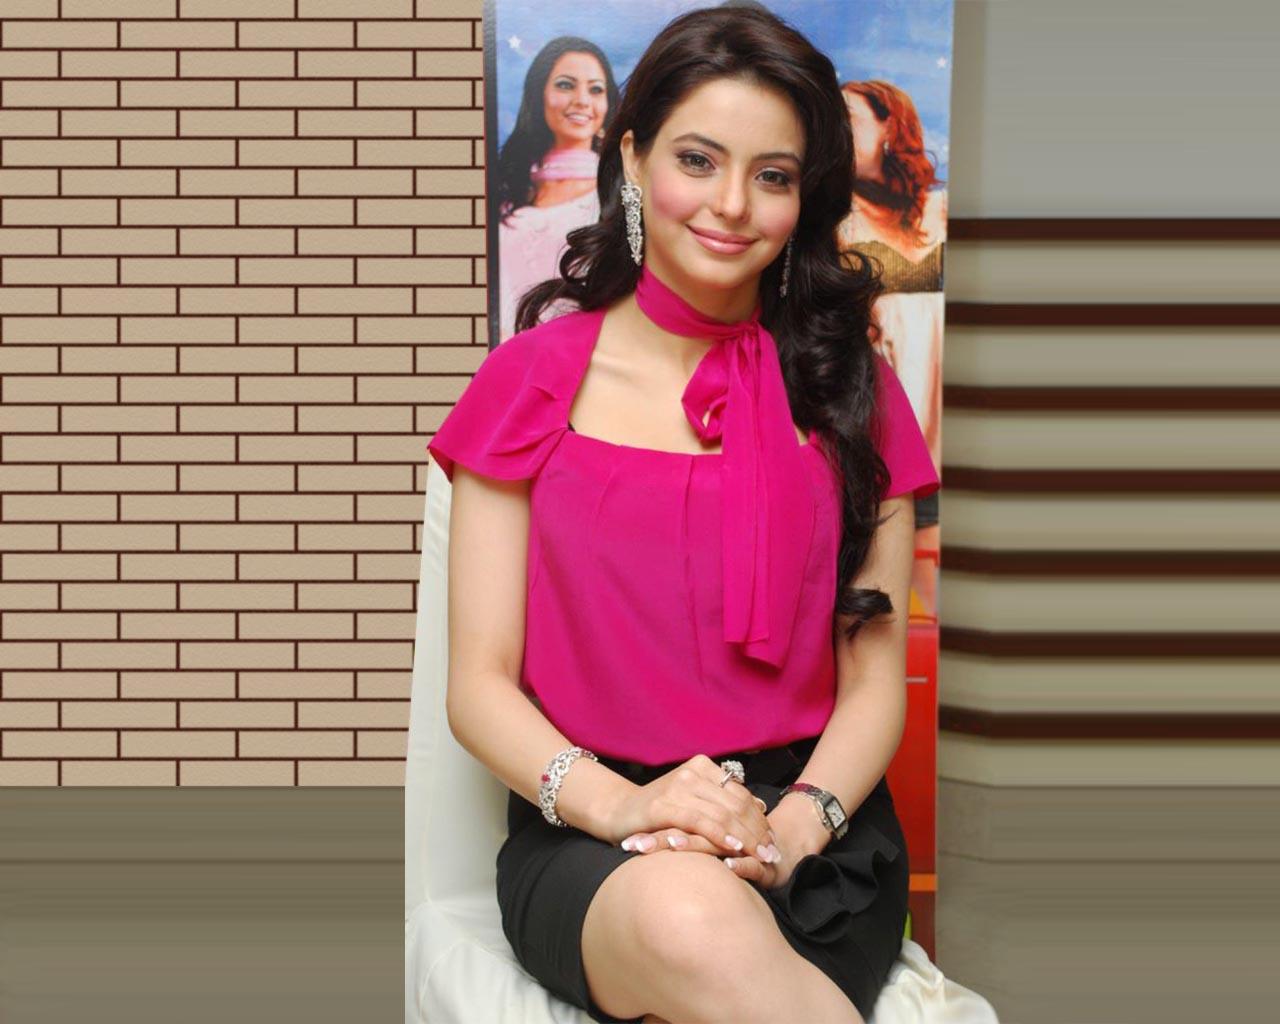 http://1.bp.blogspot.com/-q_W5FJFHc-o/T-KsARU4XUI/AAAAAAAAB8I/fgHl5_6rU2g/s1600/actressunseengallery.blogspot.com+amna-sharif-wallpapers+(1).jpg